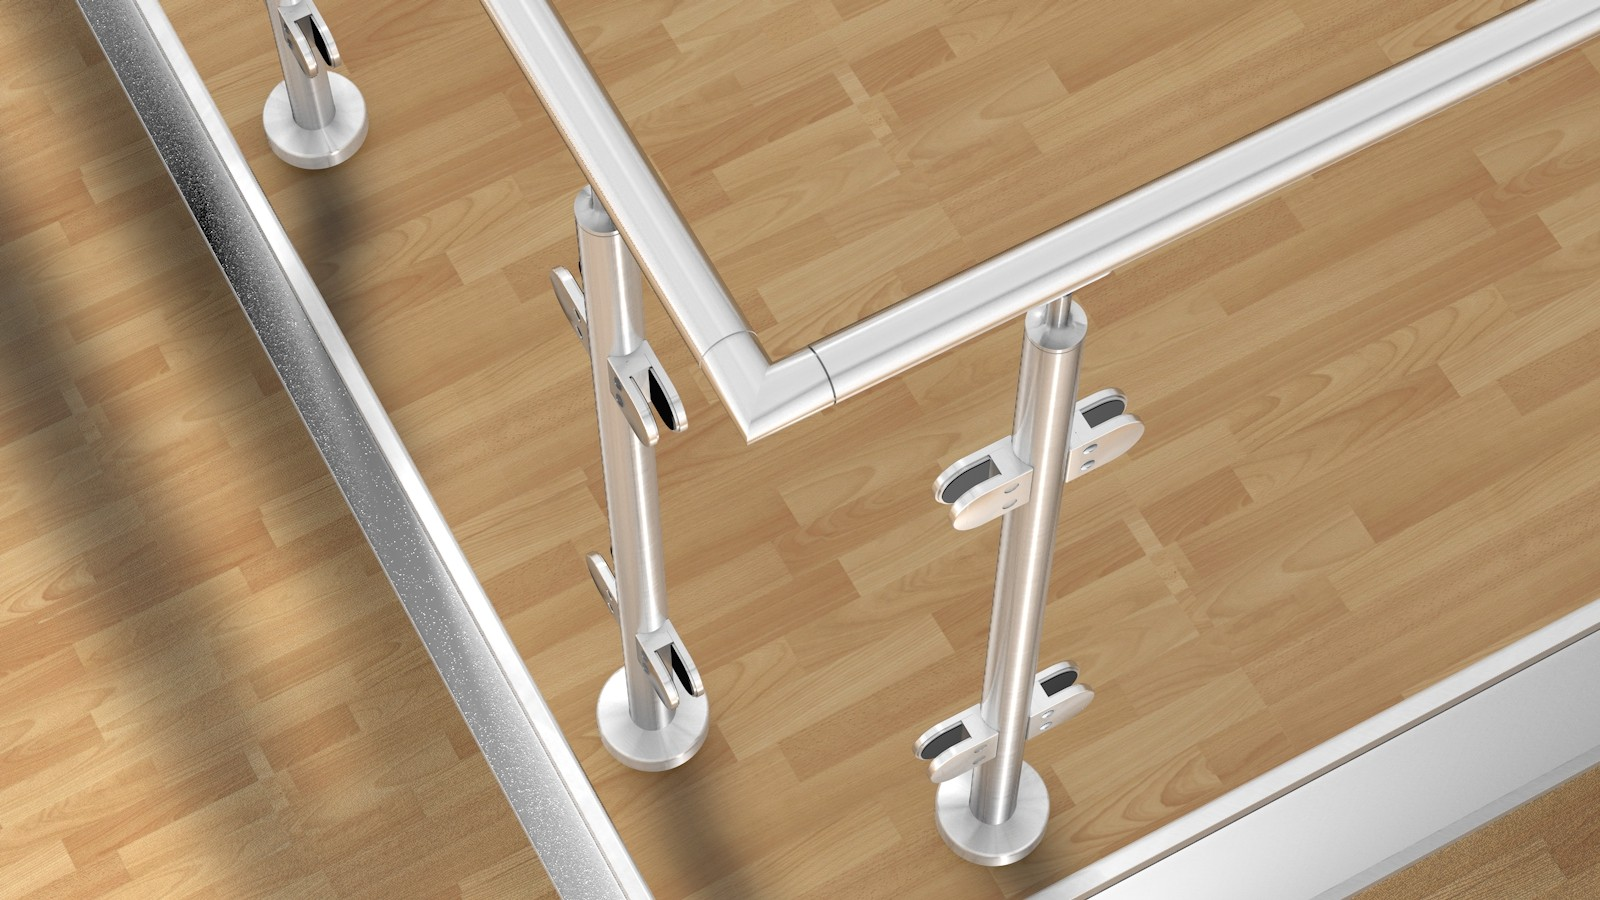 edelstahl glas pfosten gel nder bausatz u form 2x90. Black Bedroom Furniture Sets. Home Design Ideas